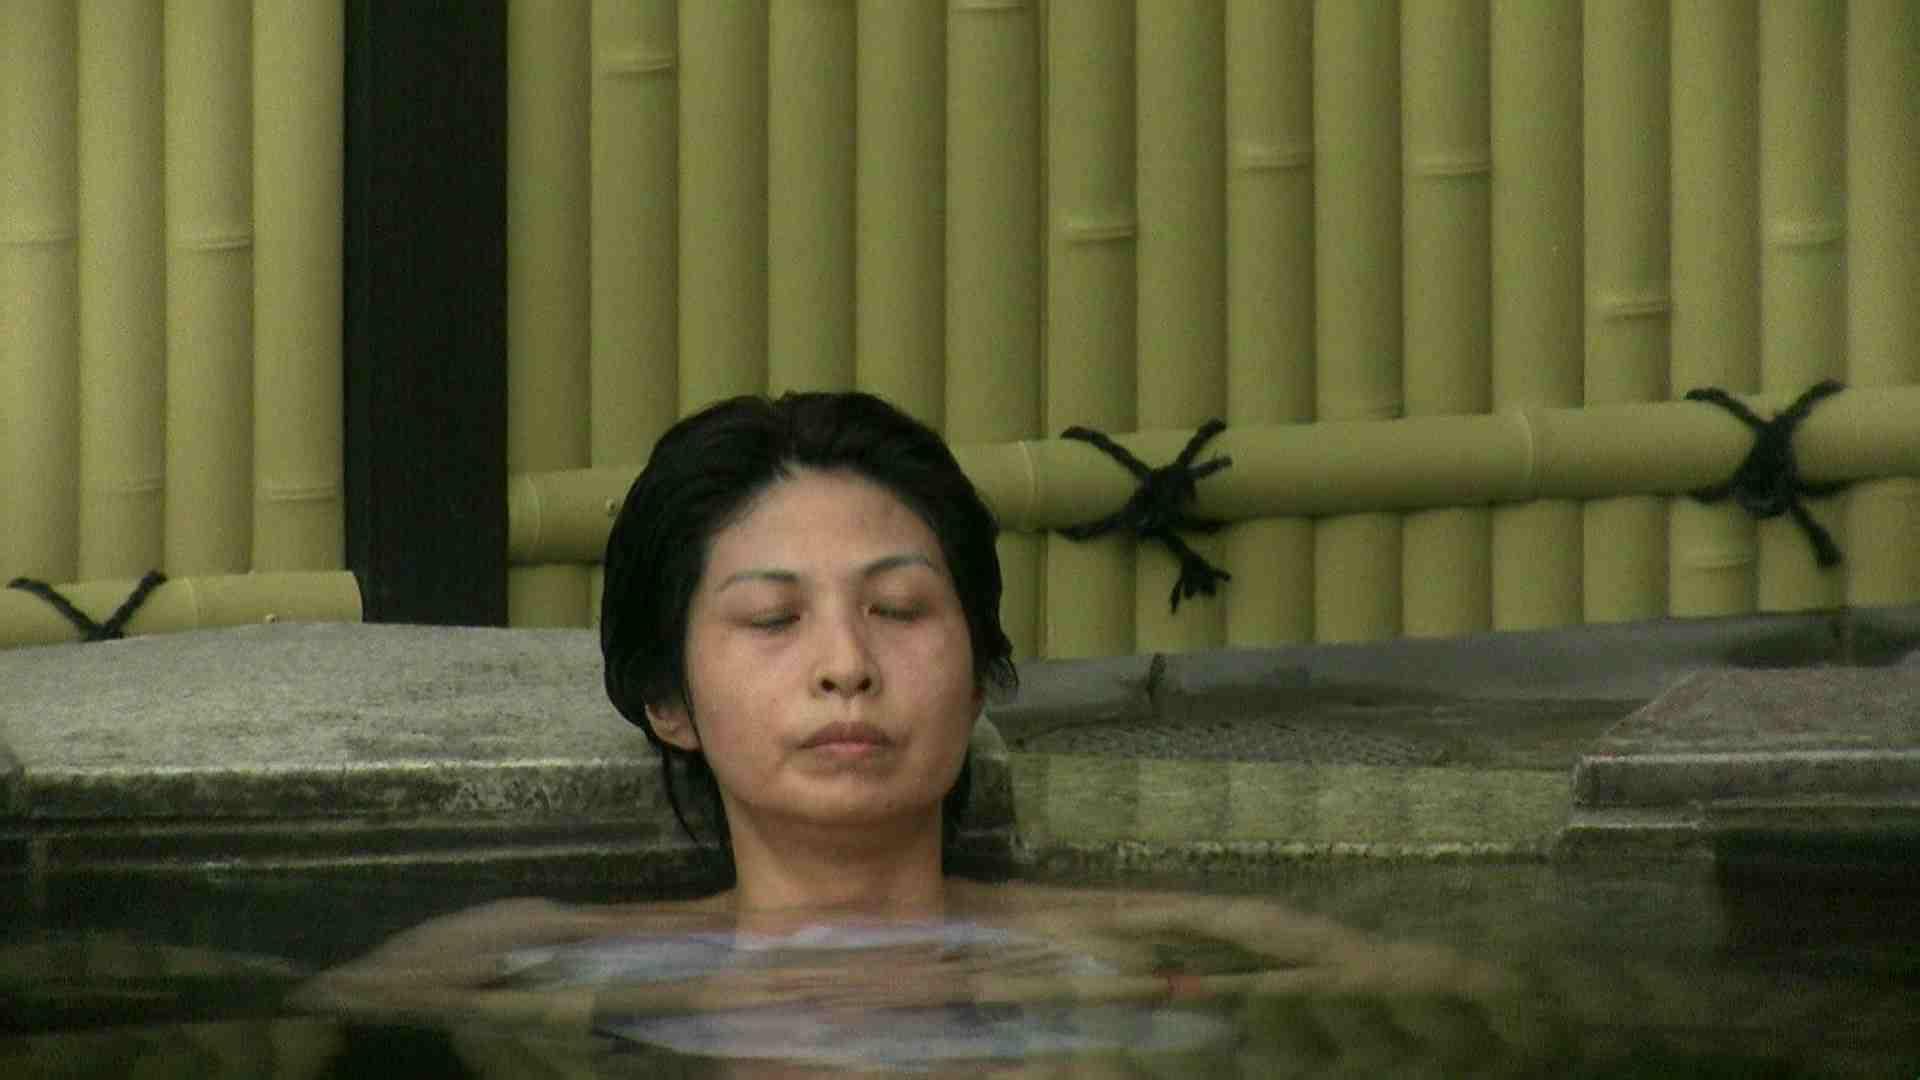 Aquaな露天風呂Vol.636 0  45連発 16